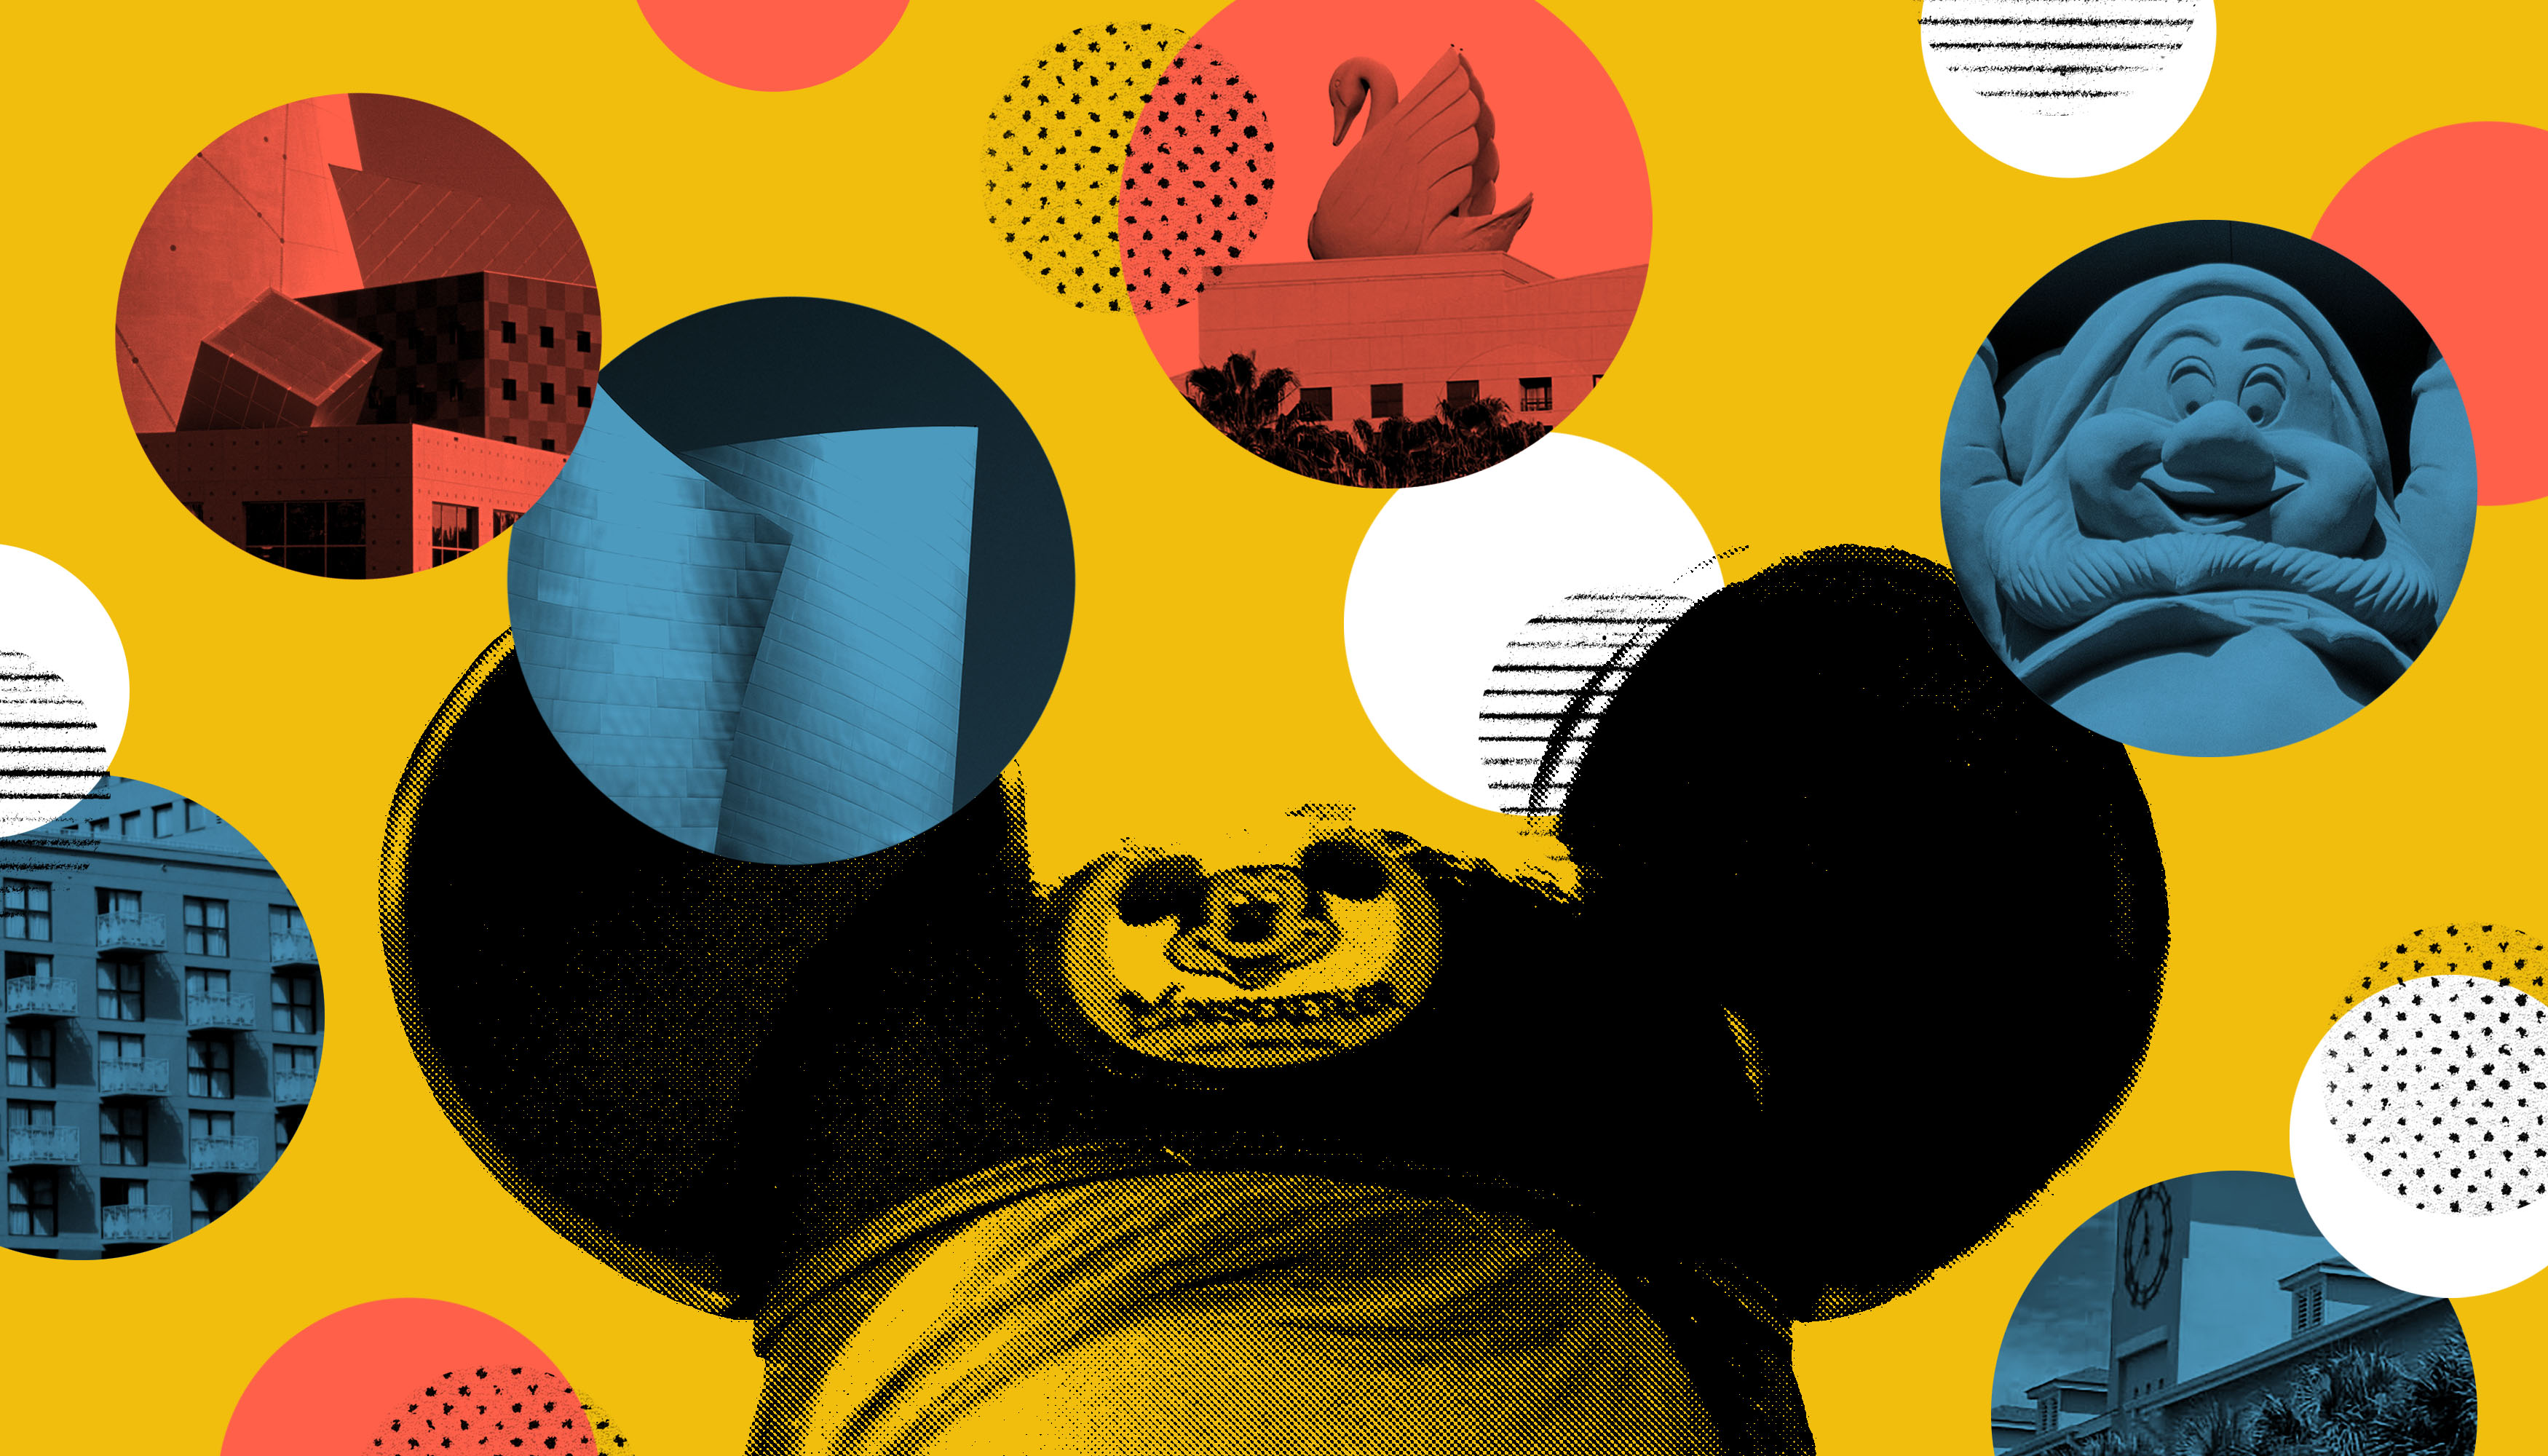 The magical (postmodern) world of Disney